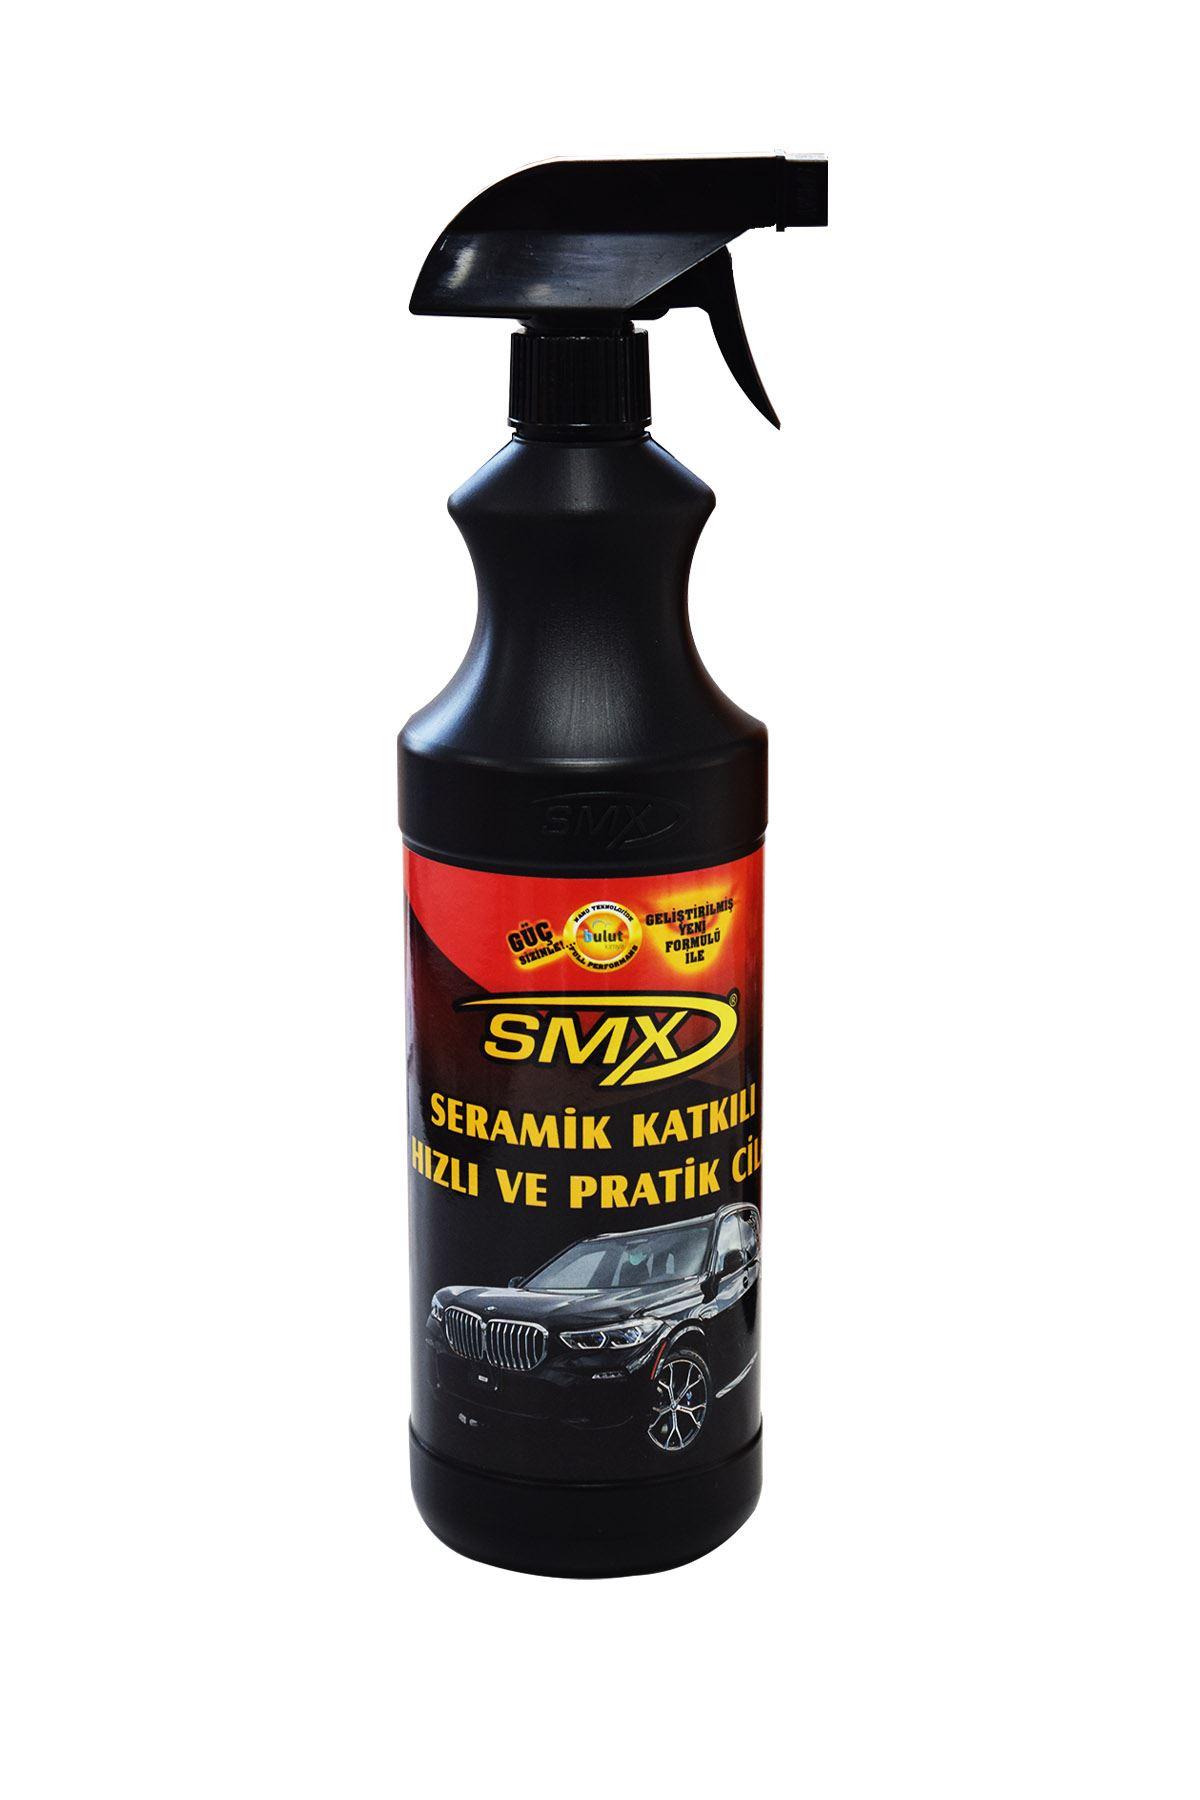 SMX Seramik Cila / Hızlı Cila / Pratik Cila (1 LT)